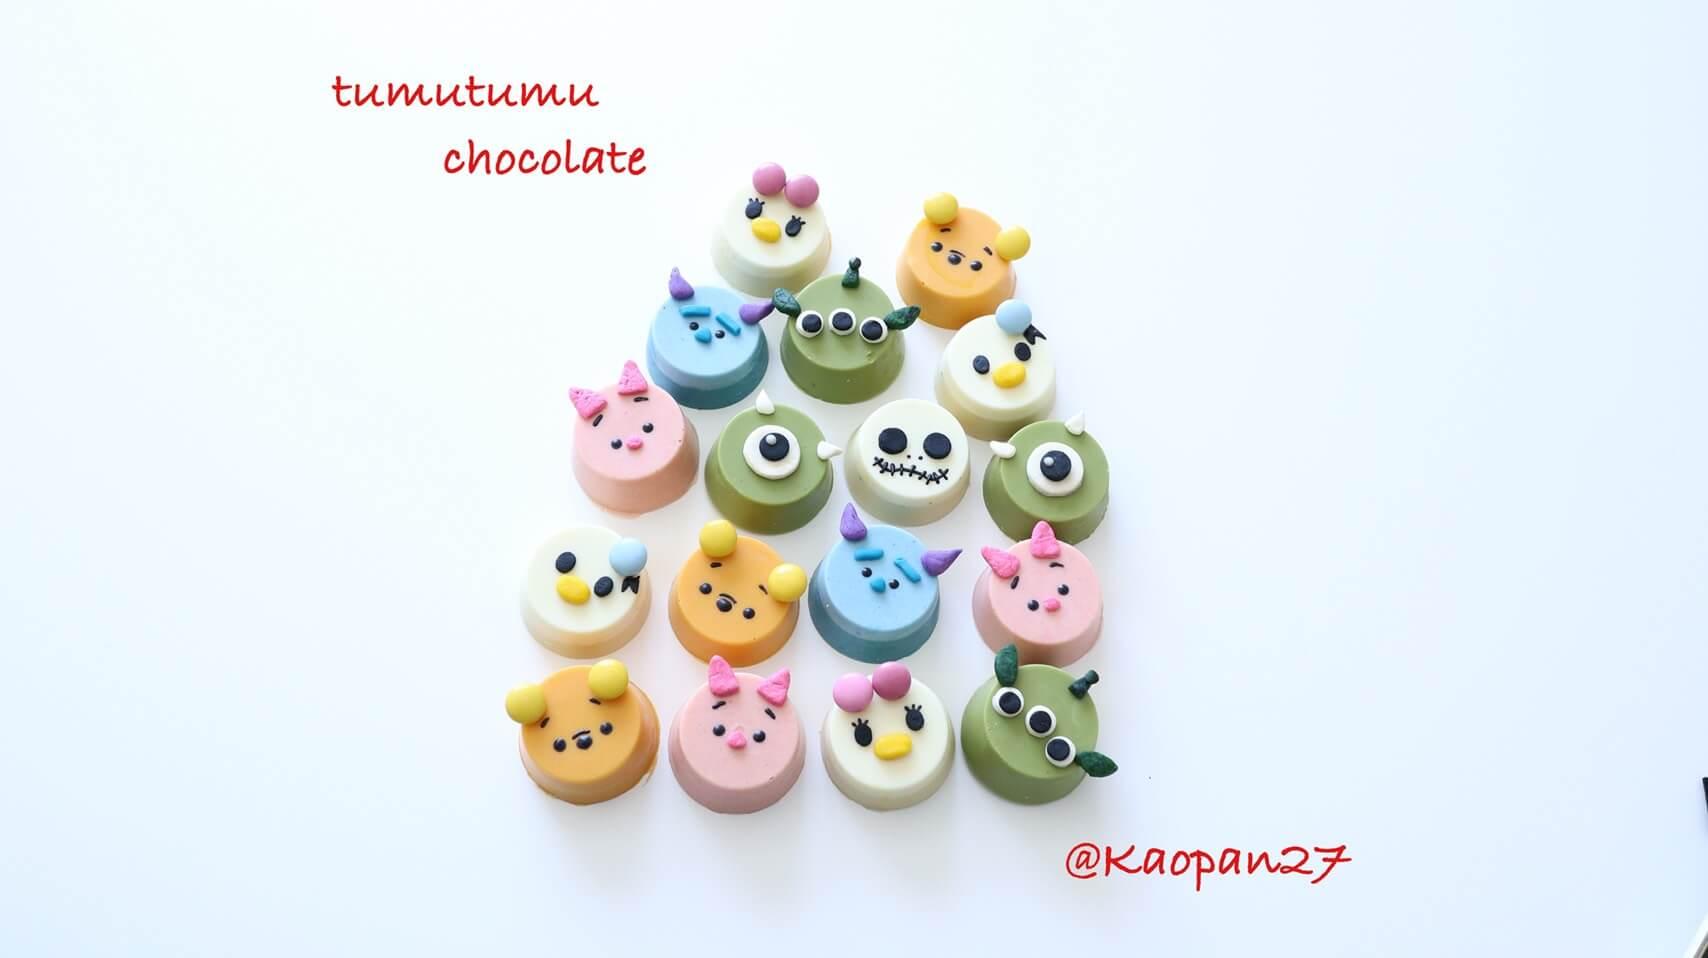 kaori レシピ ディズニー スイーツ recipe disney sweets 甜點 食譜